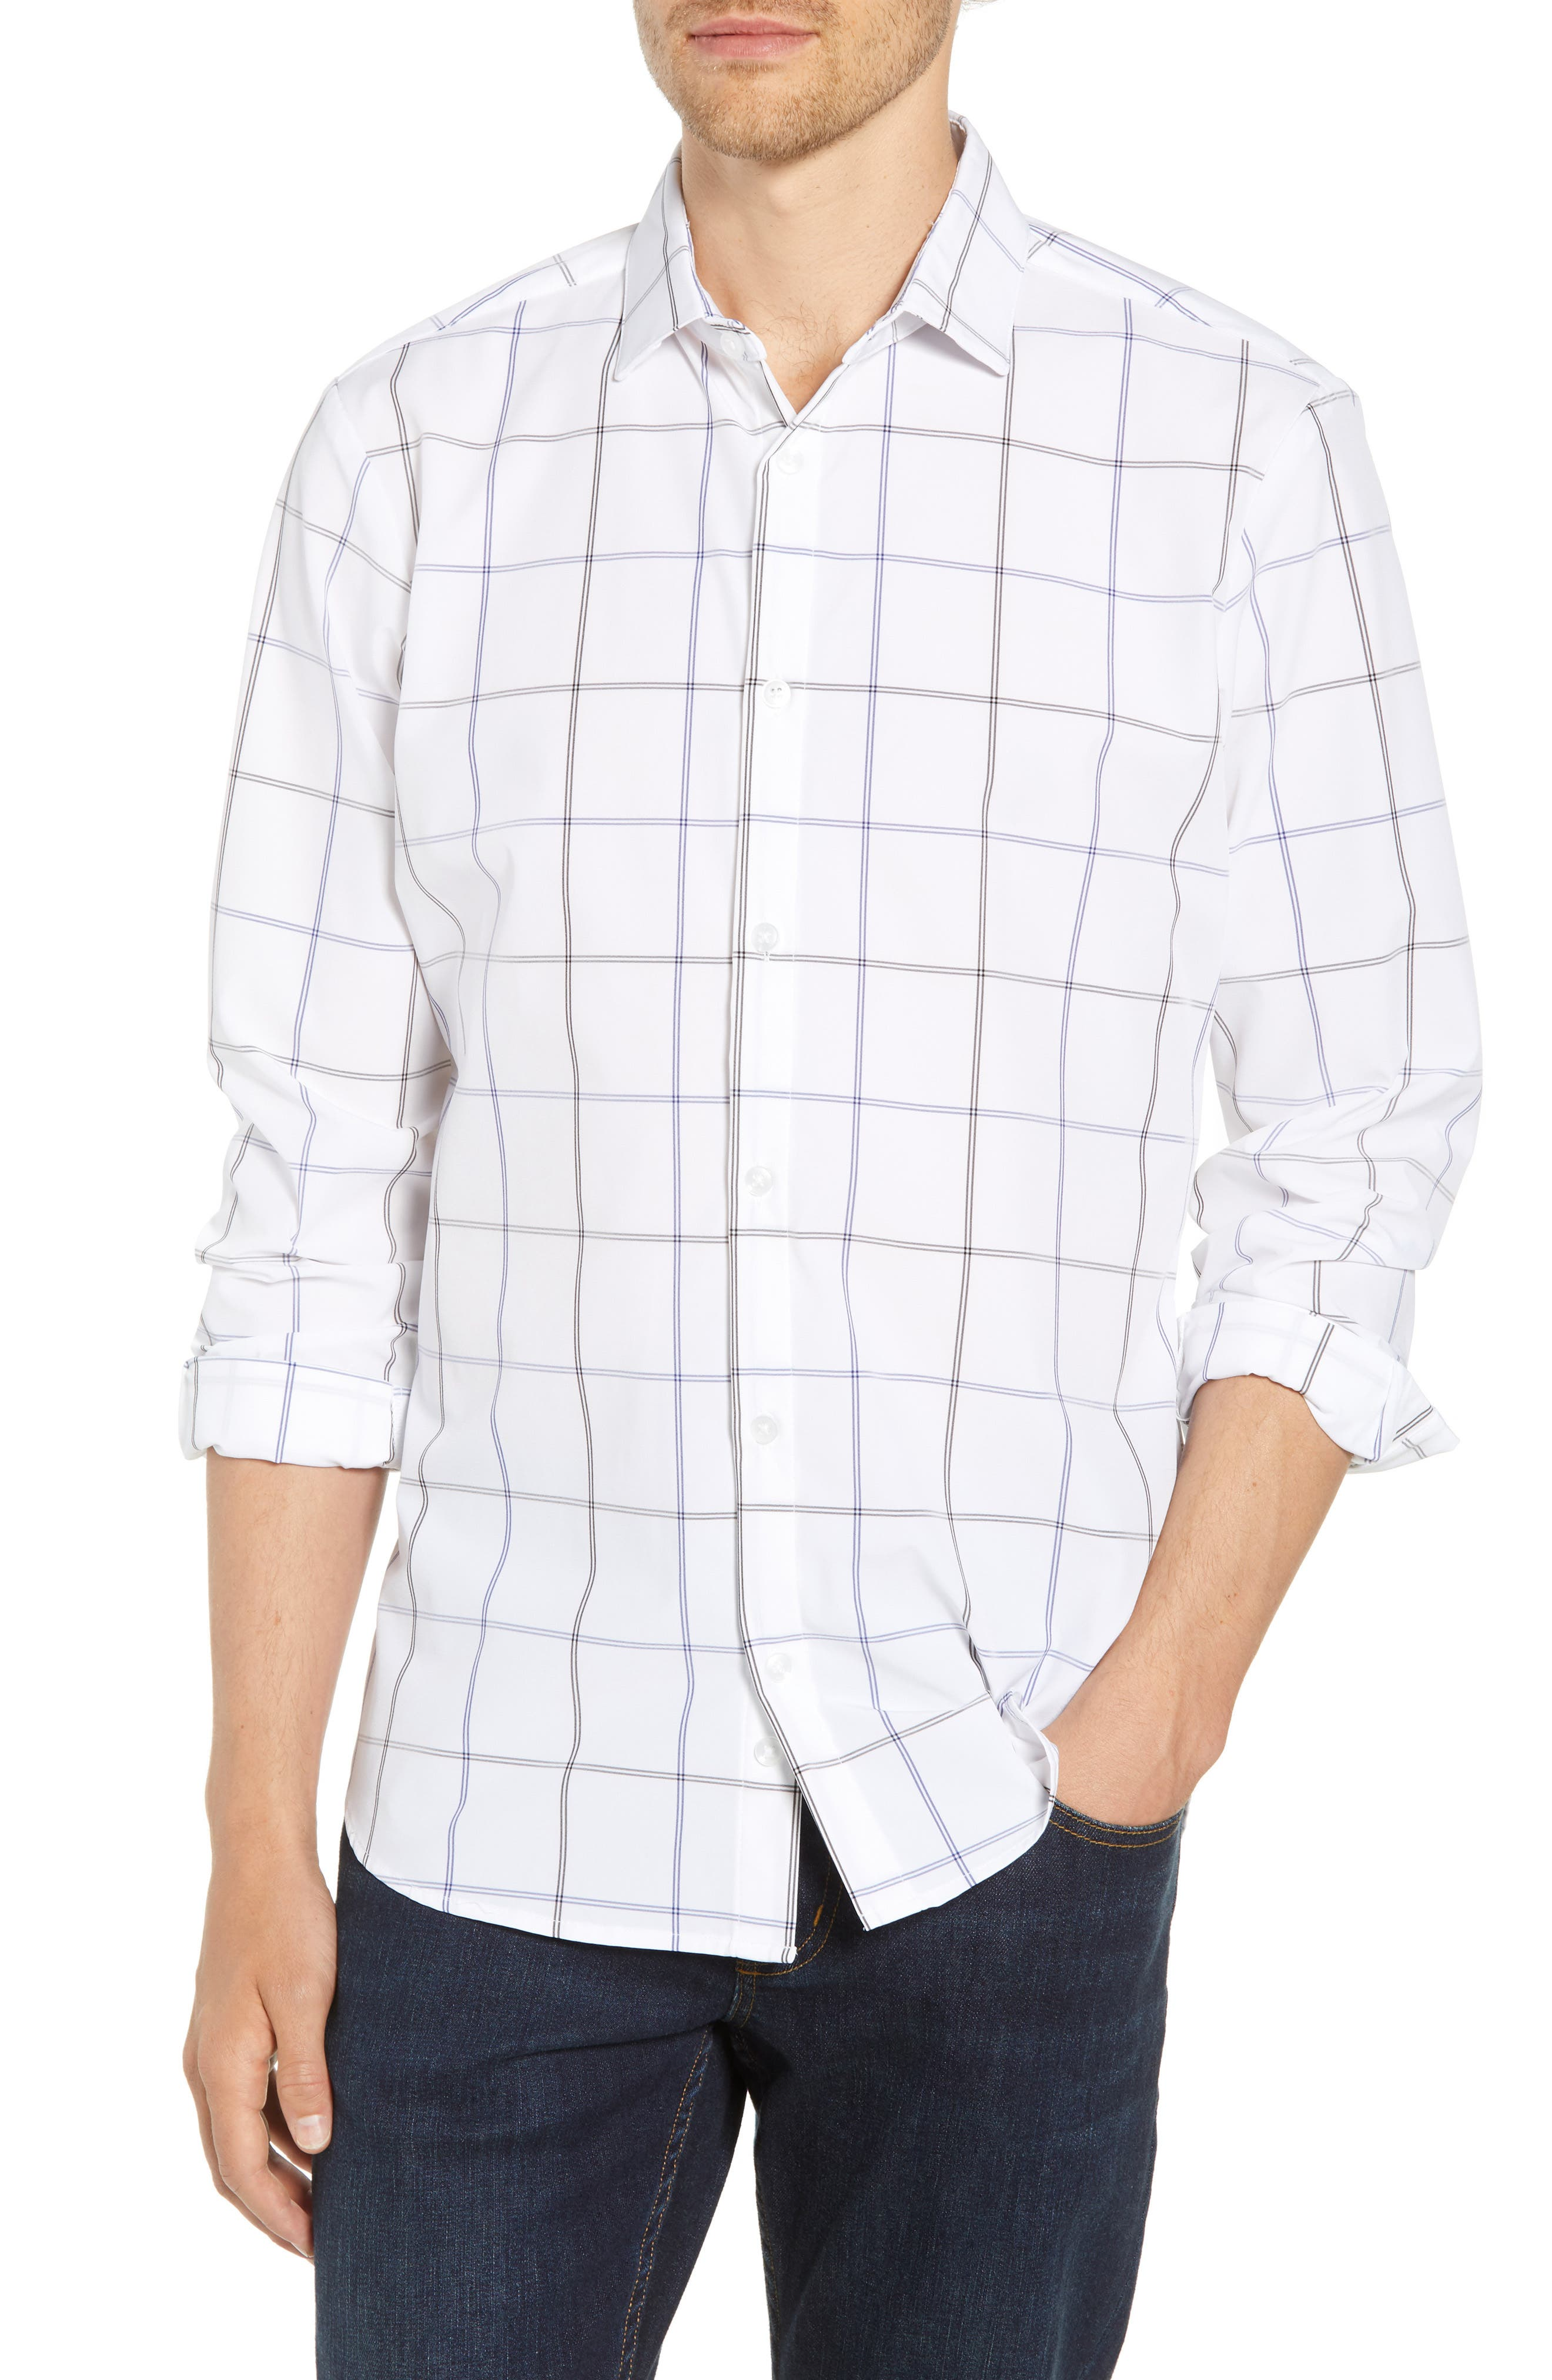 Crossman Slim Fit Grid Performance Sport Shirt,                             Main thumbnail 1, color,                             WHITE